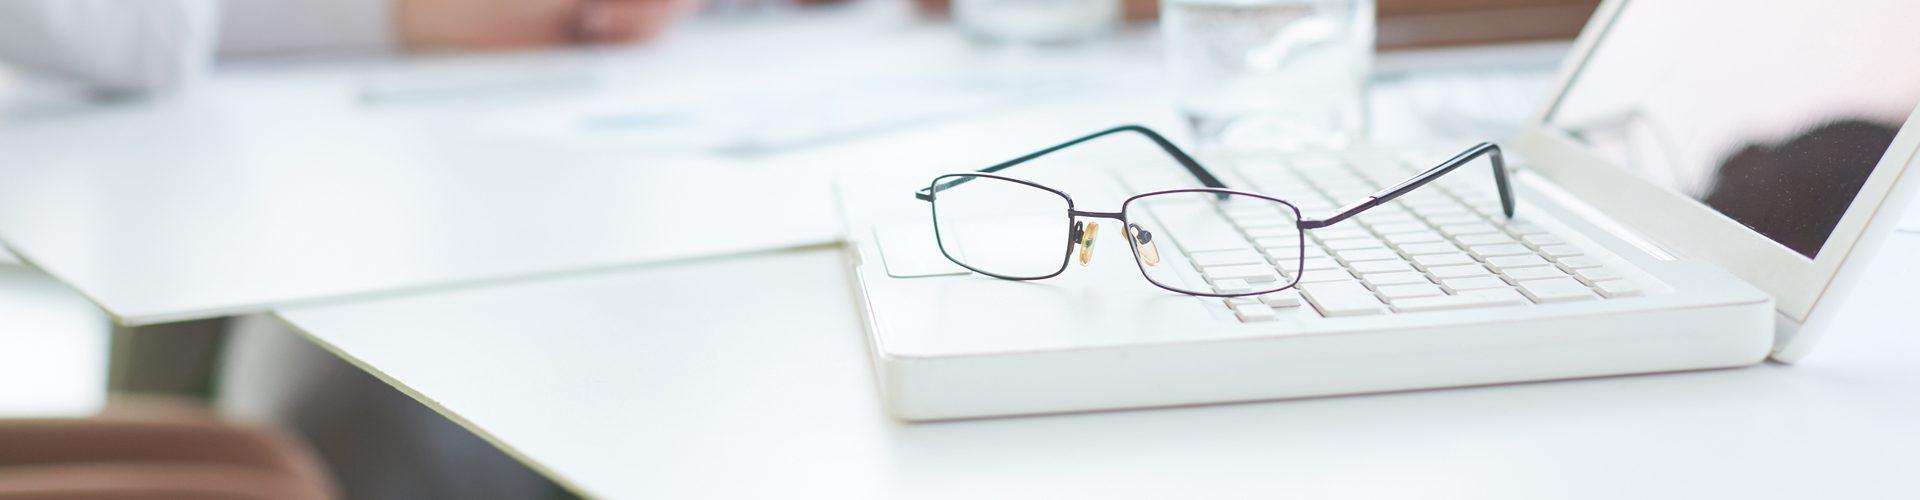 Specky Four Eyes - glasses